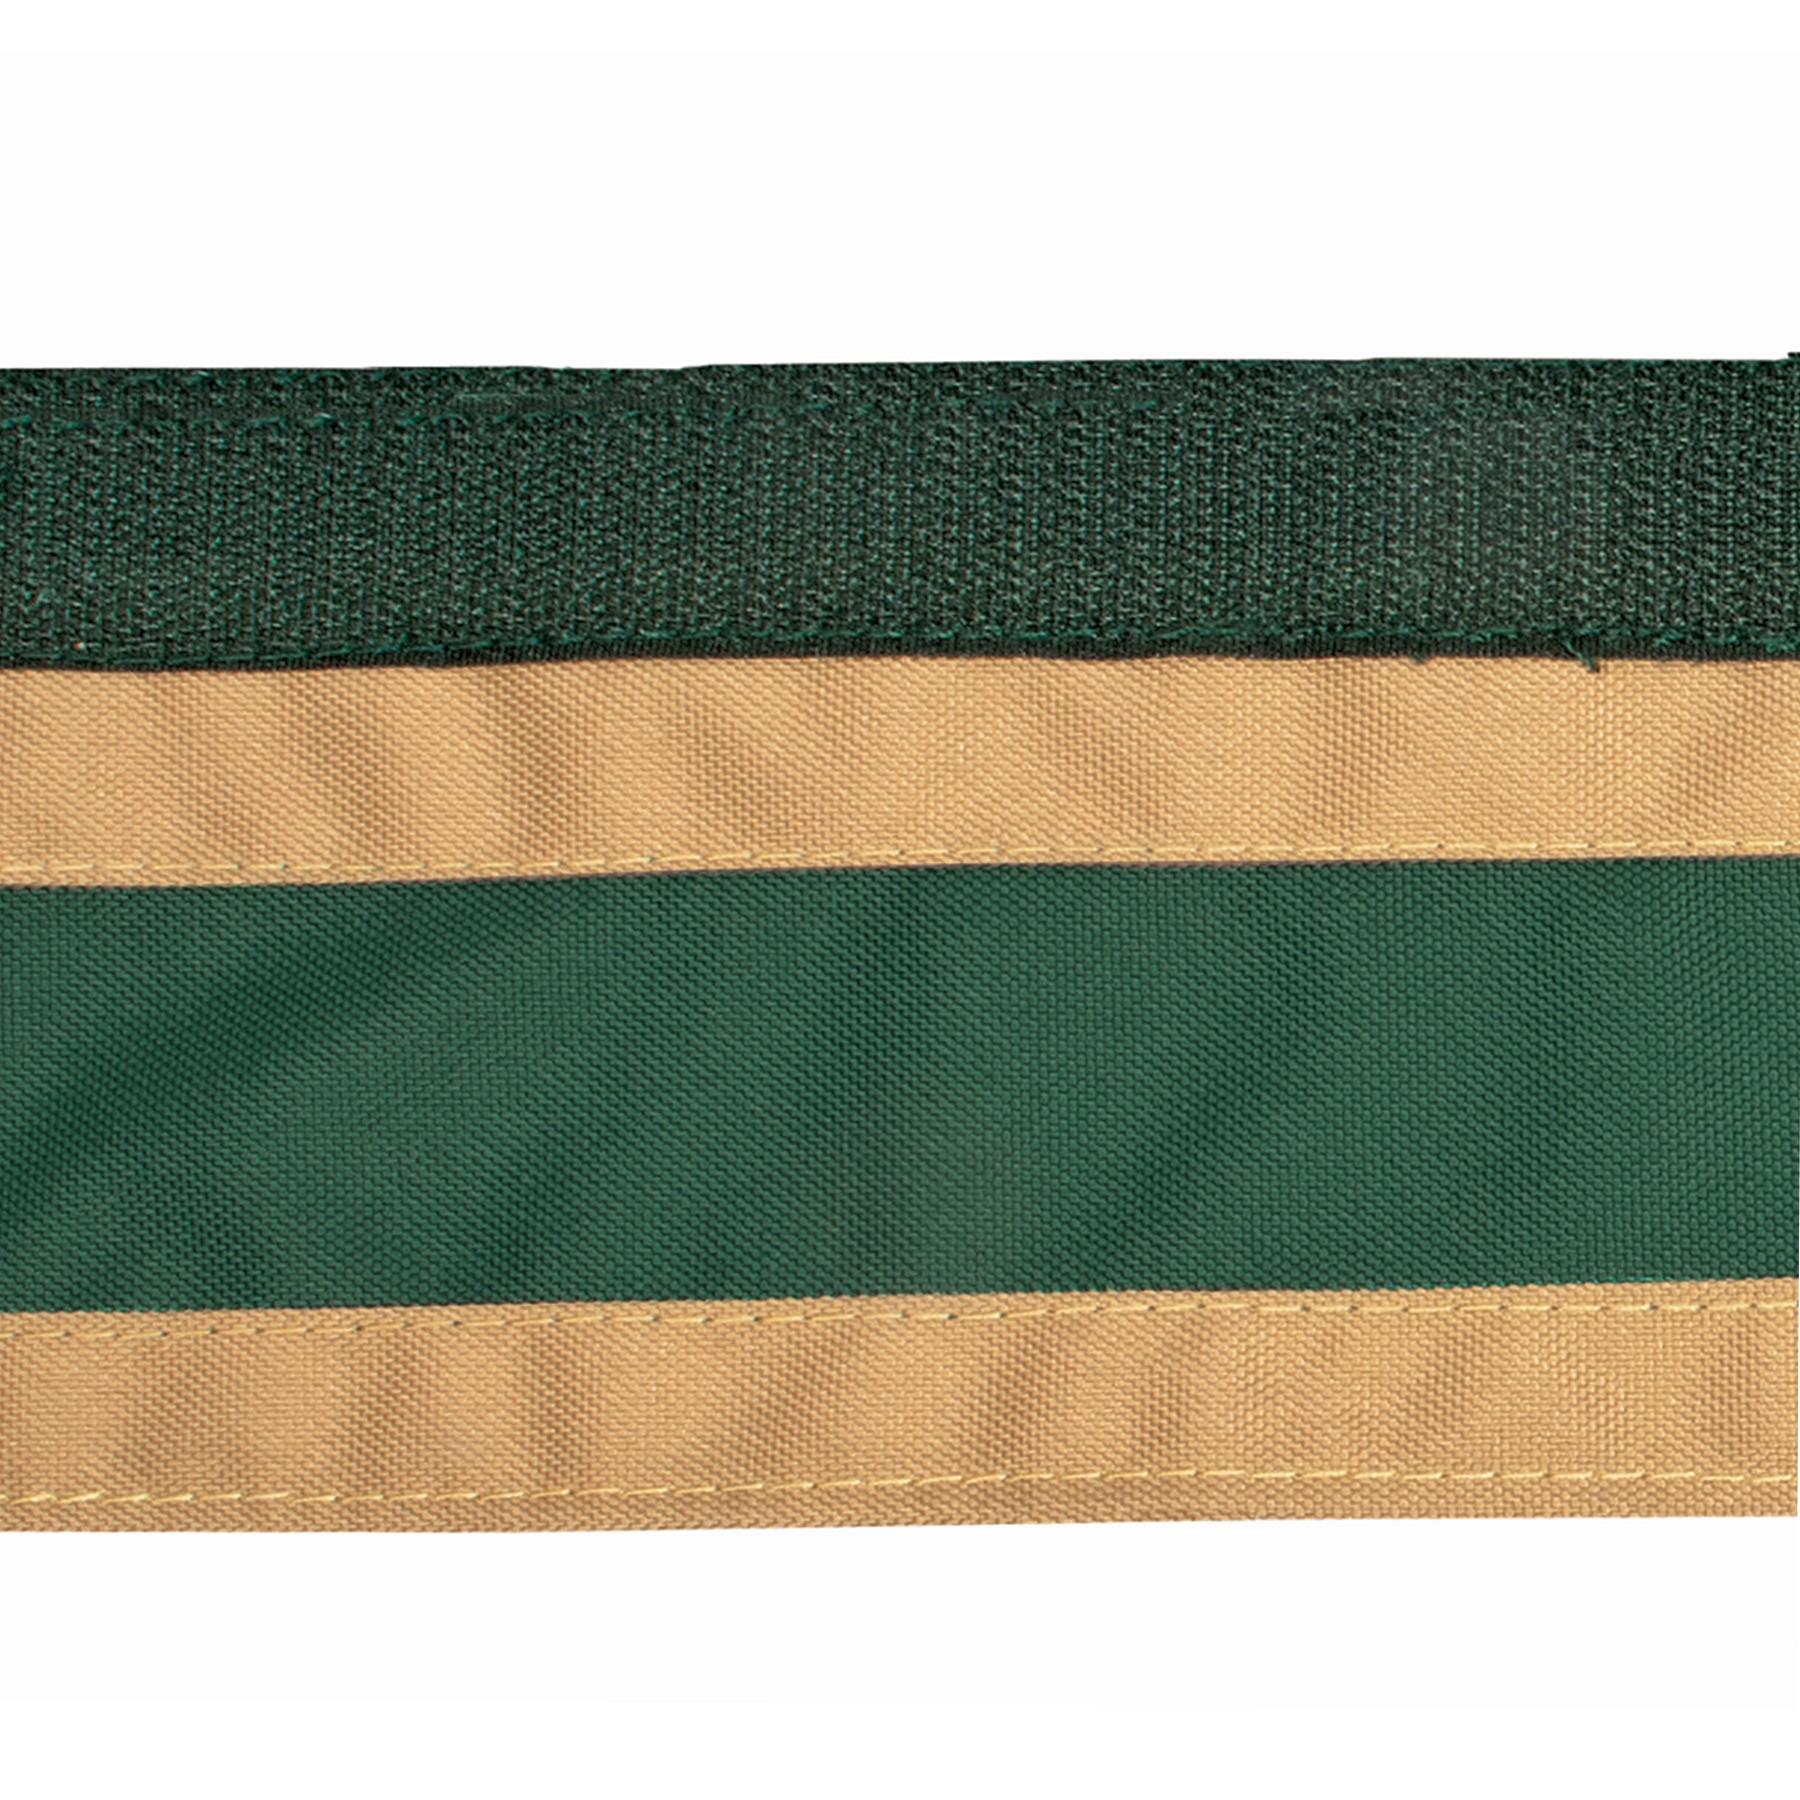 ai33216 Dura-Tech® Two Color Valance Stripe-tan-green